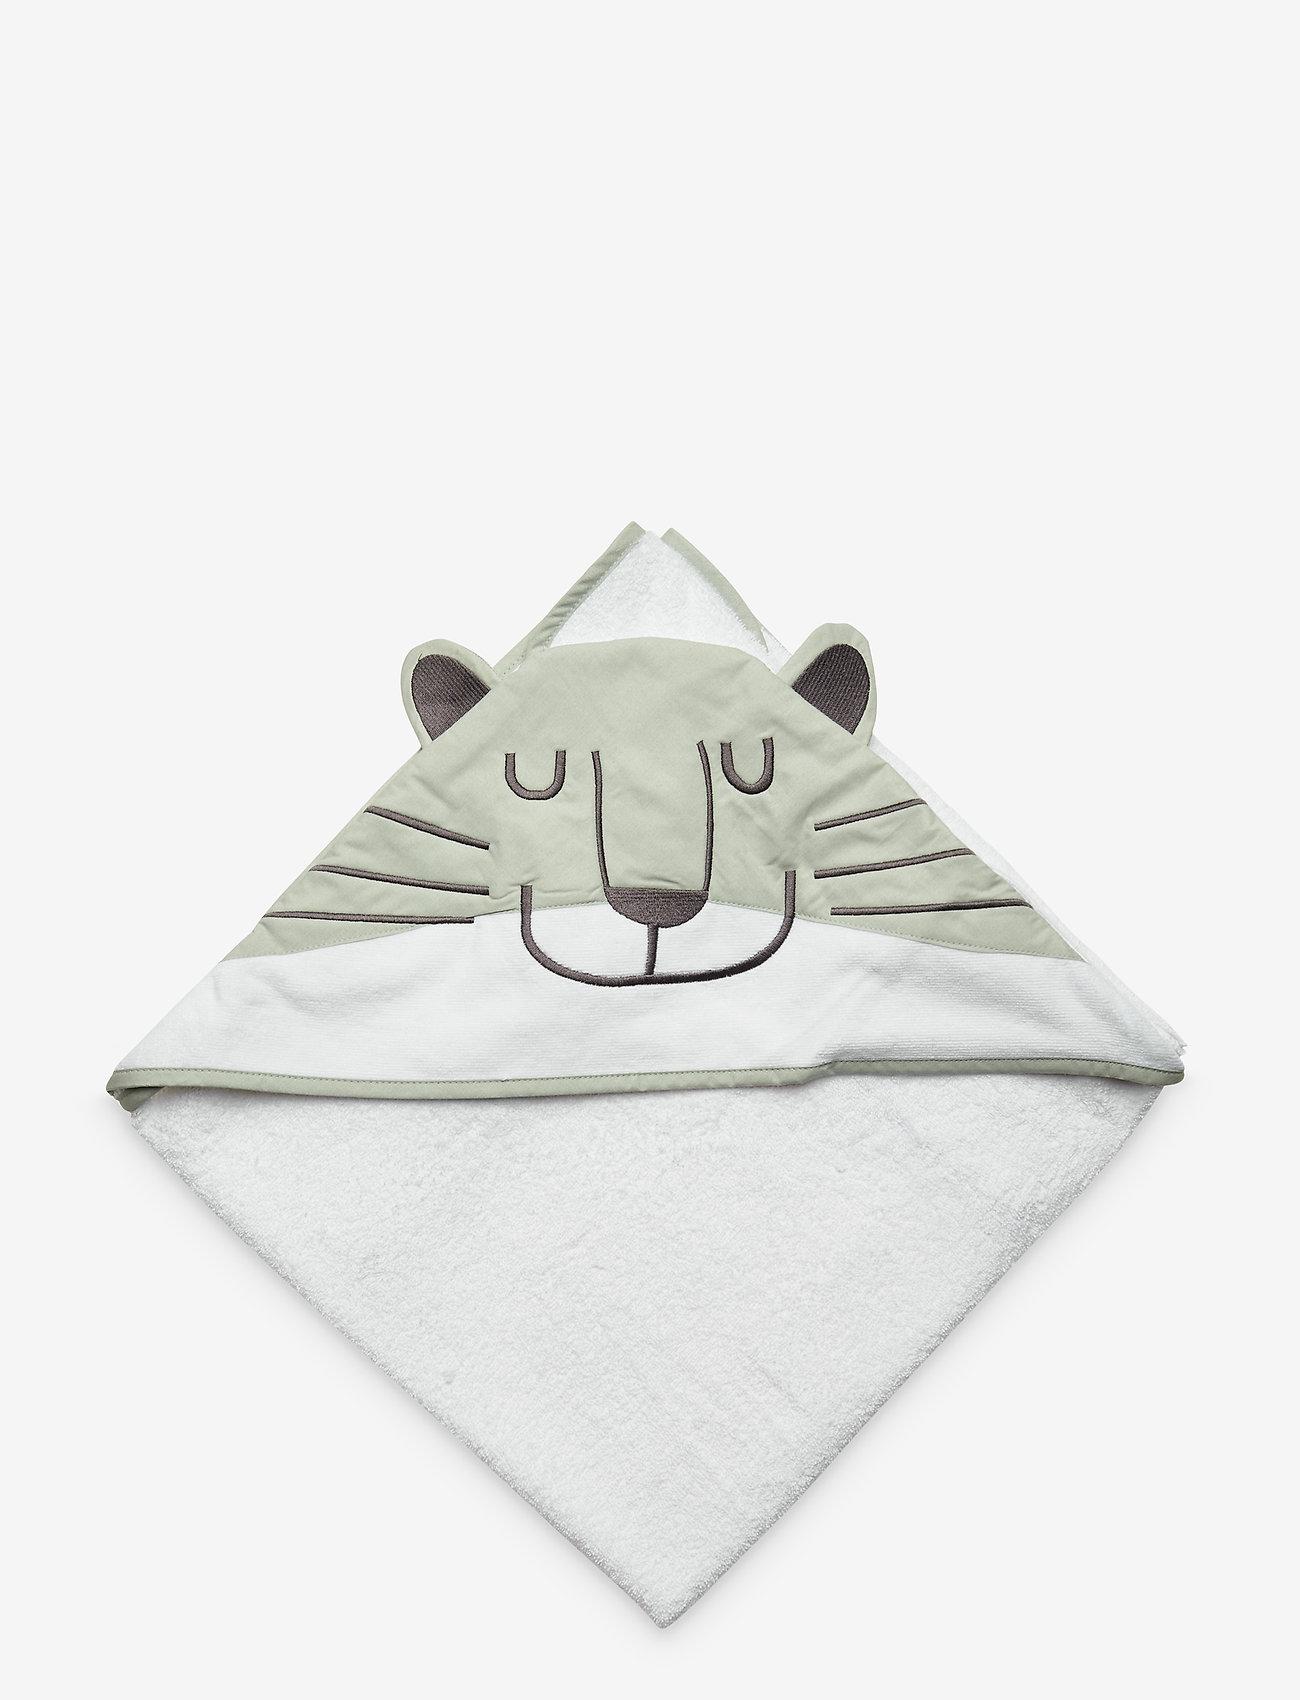 Cozy by Dozy - Cozy by Dozy Hooded Towel - akcesoria - green - 1